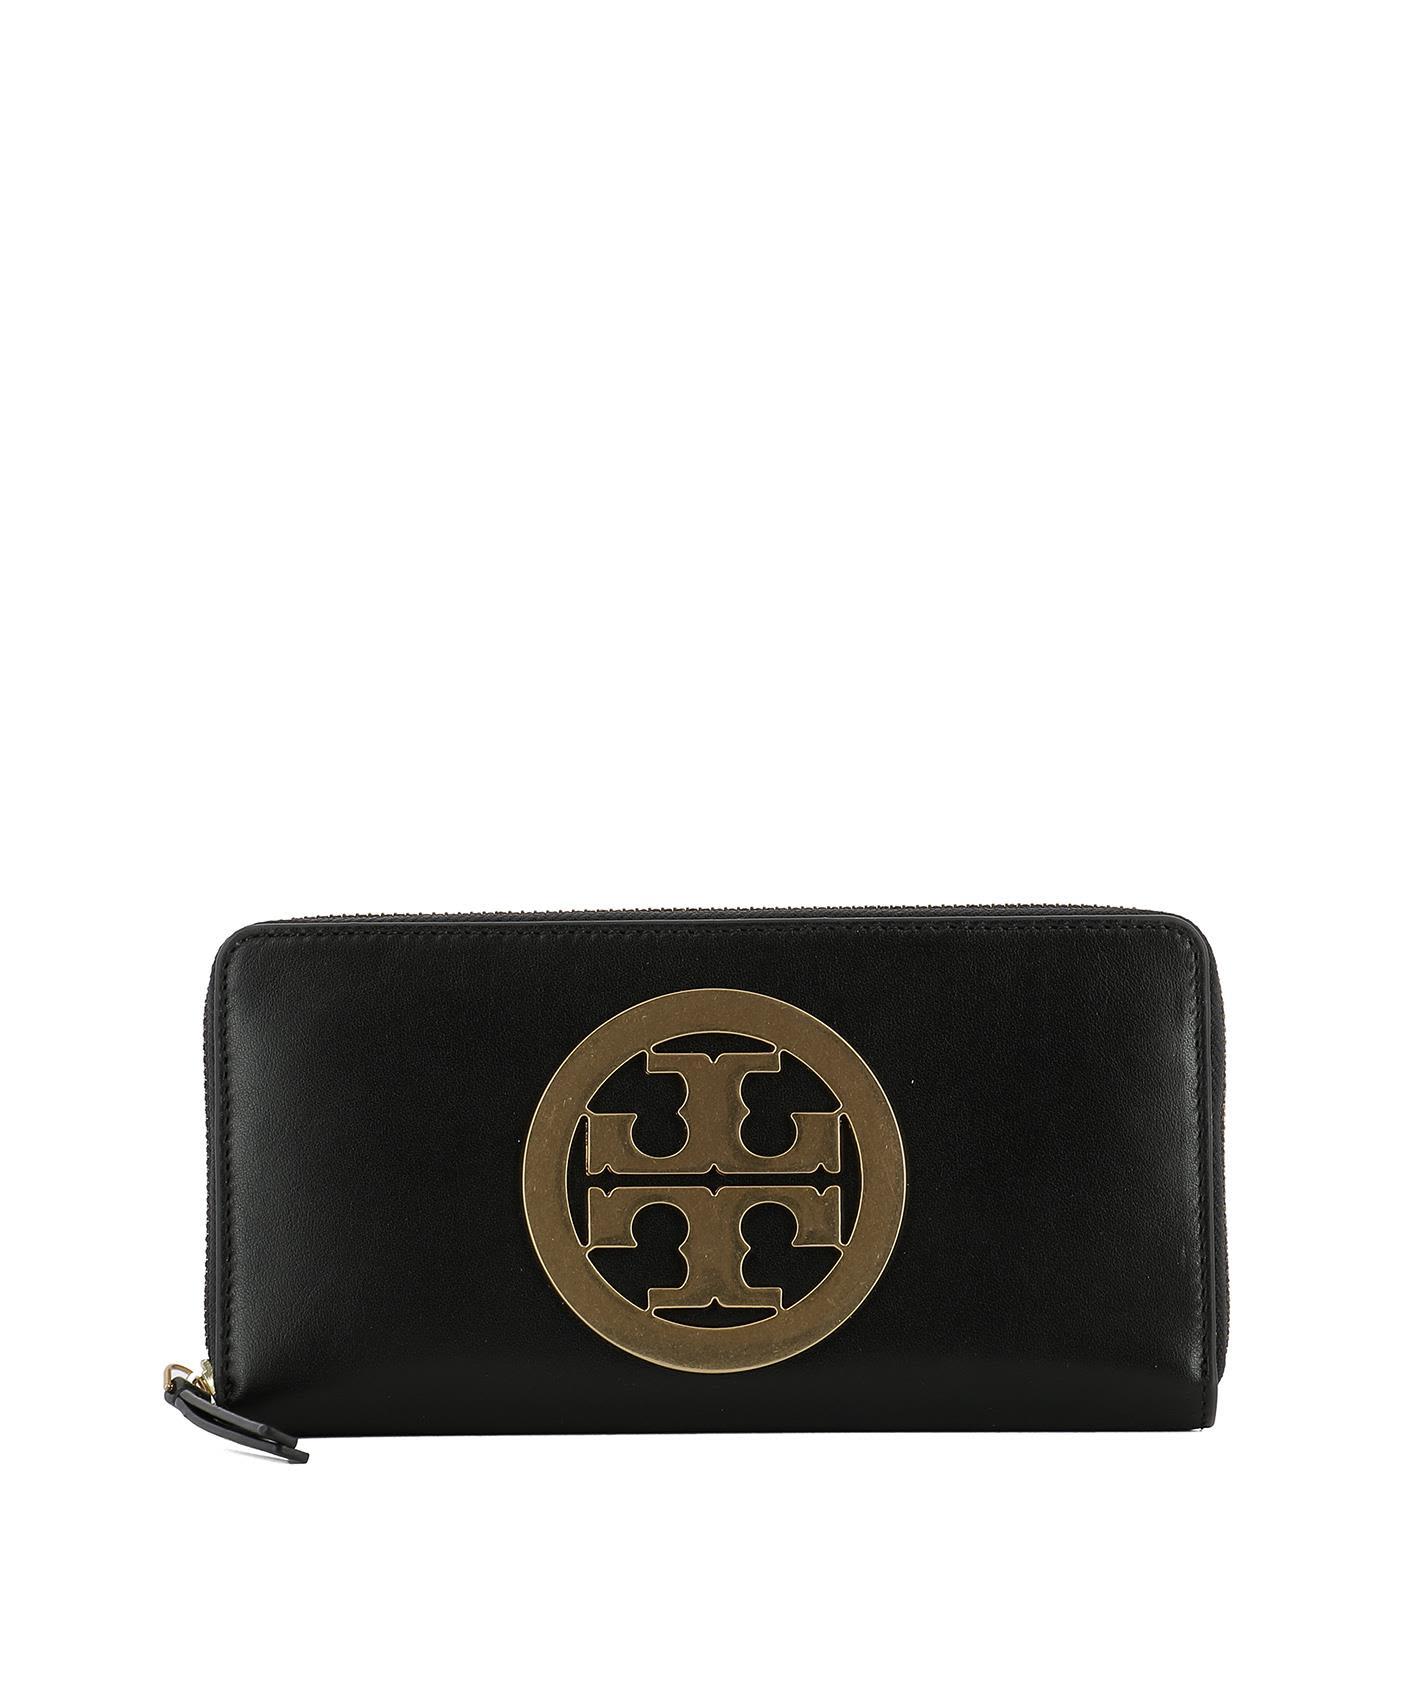 tory burch black leather wallet black womens wallets